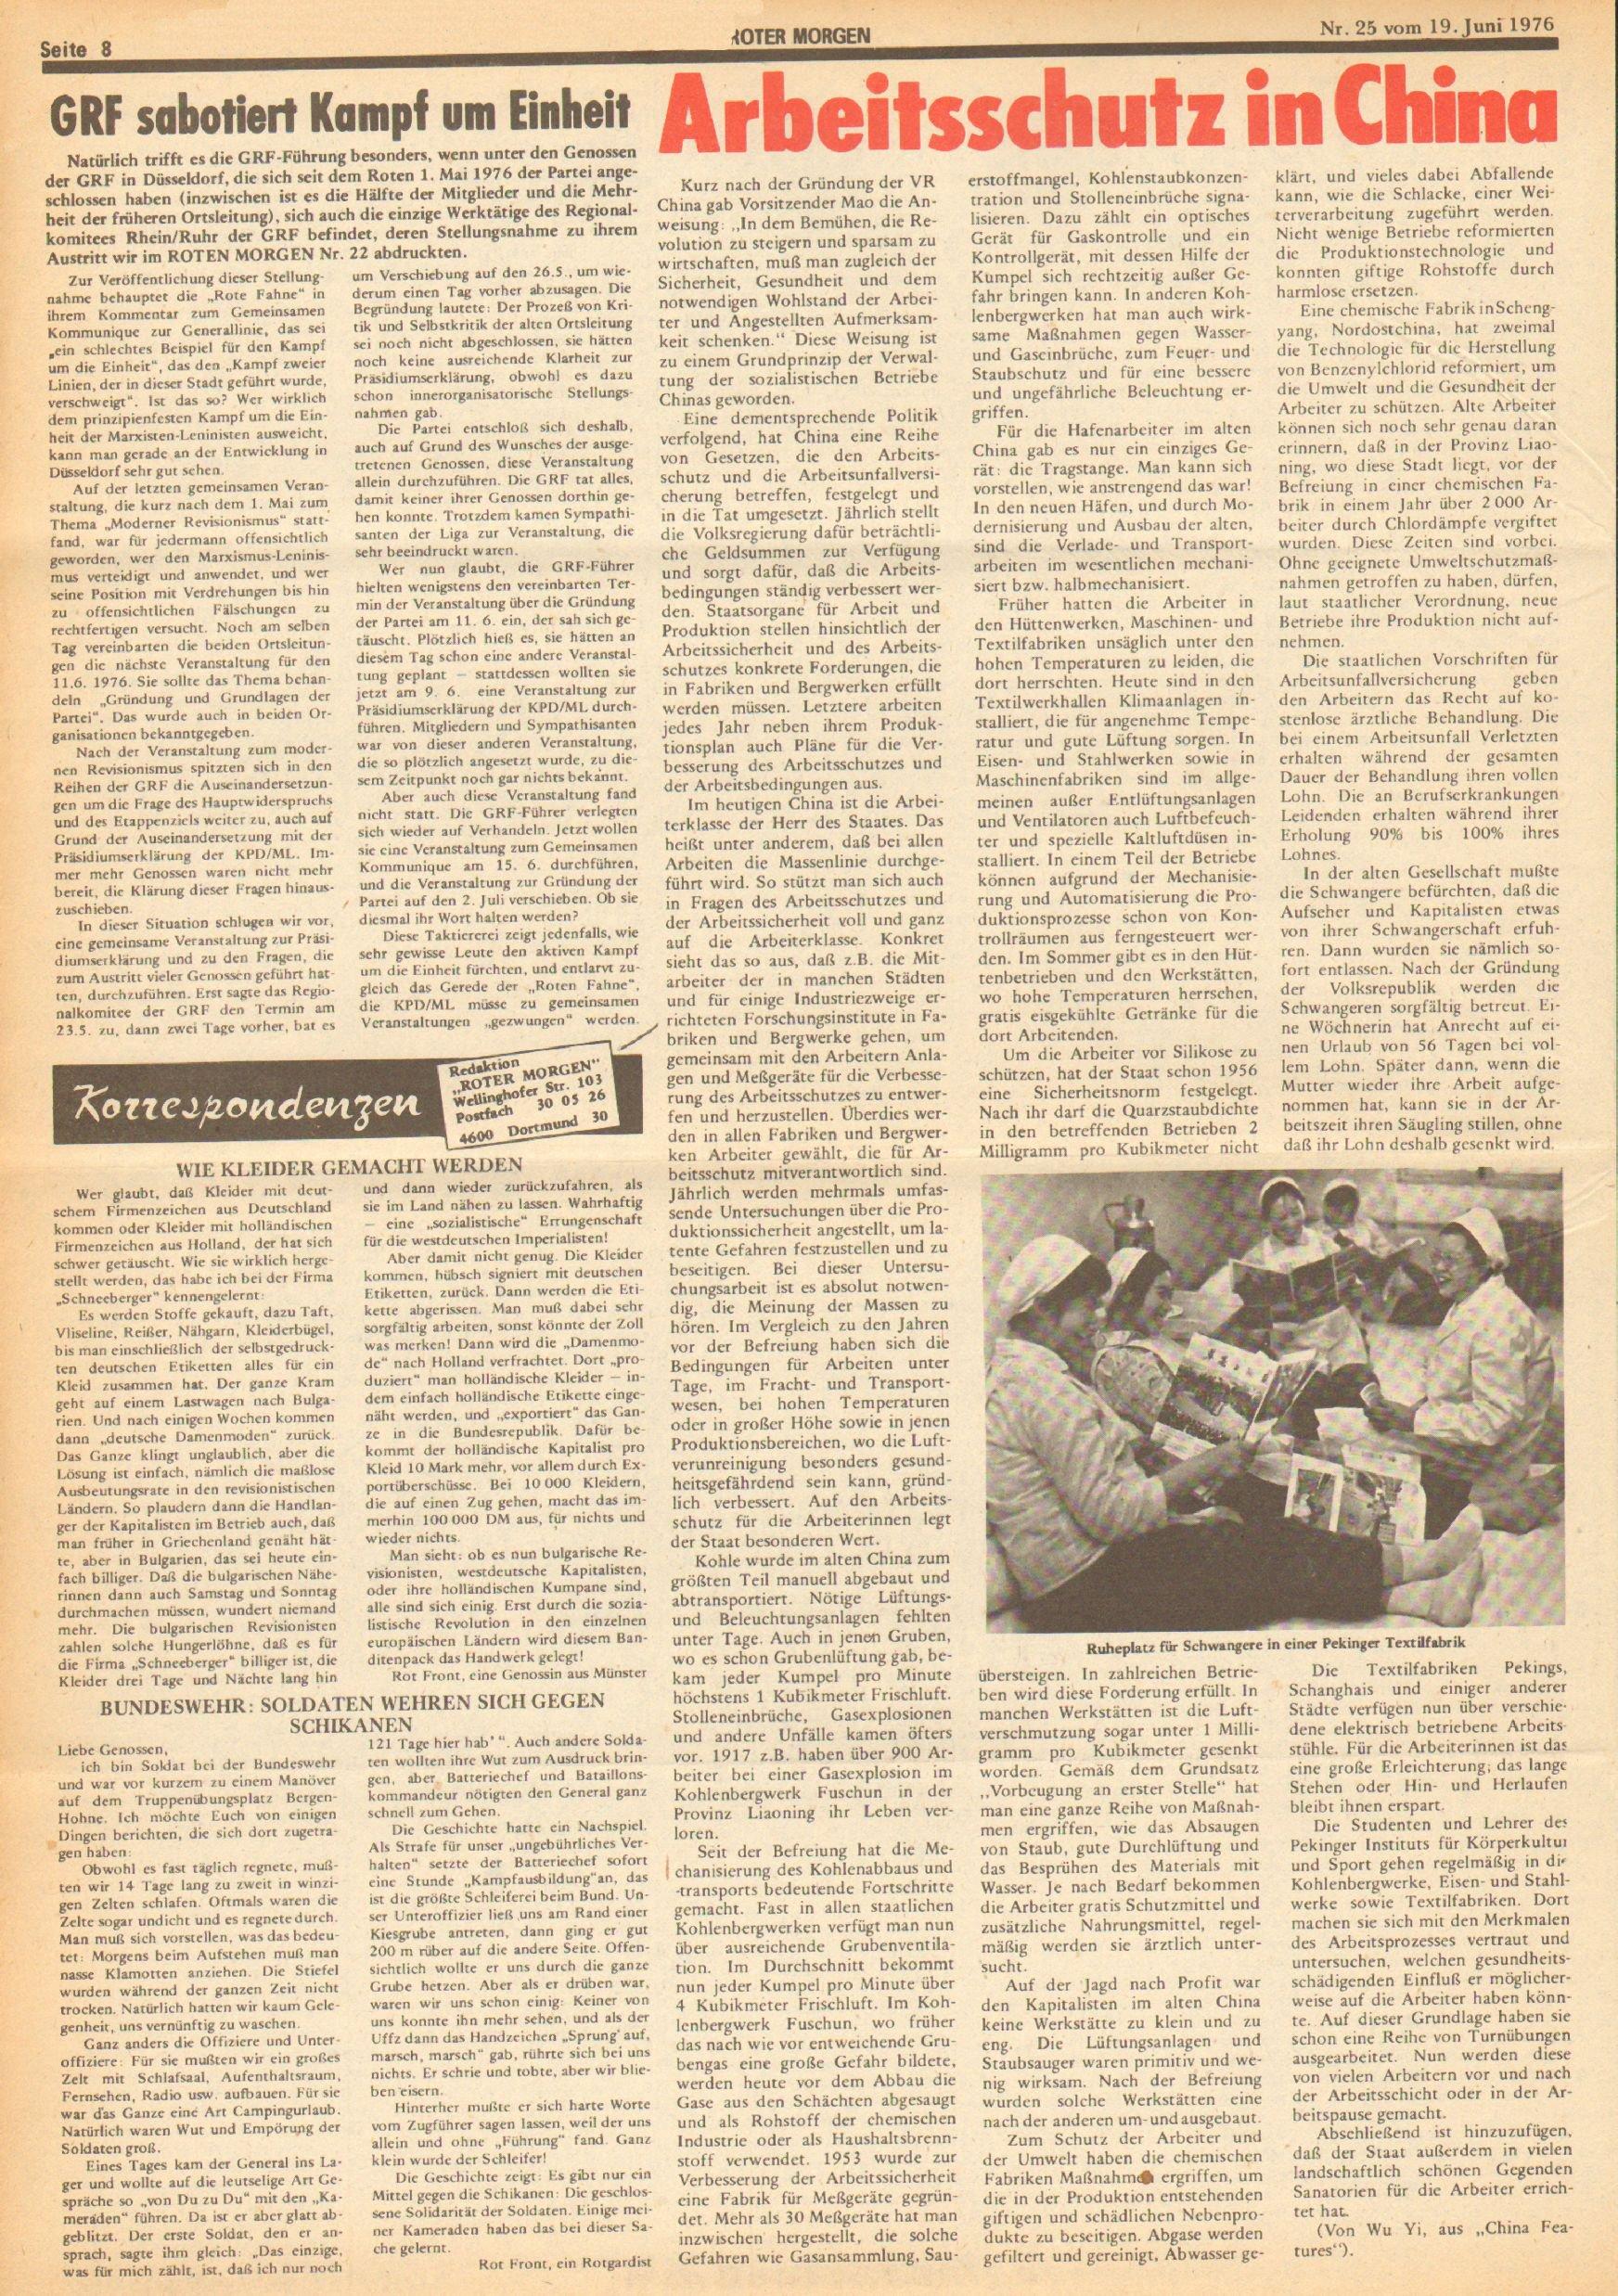 Roter Morgen, 10. Jg., 19. Juni 1976, Nr. 25, Seite 8